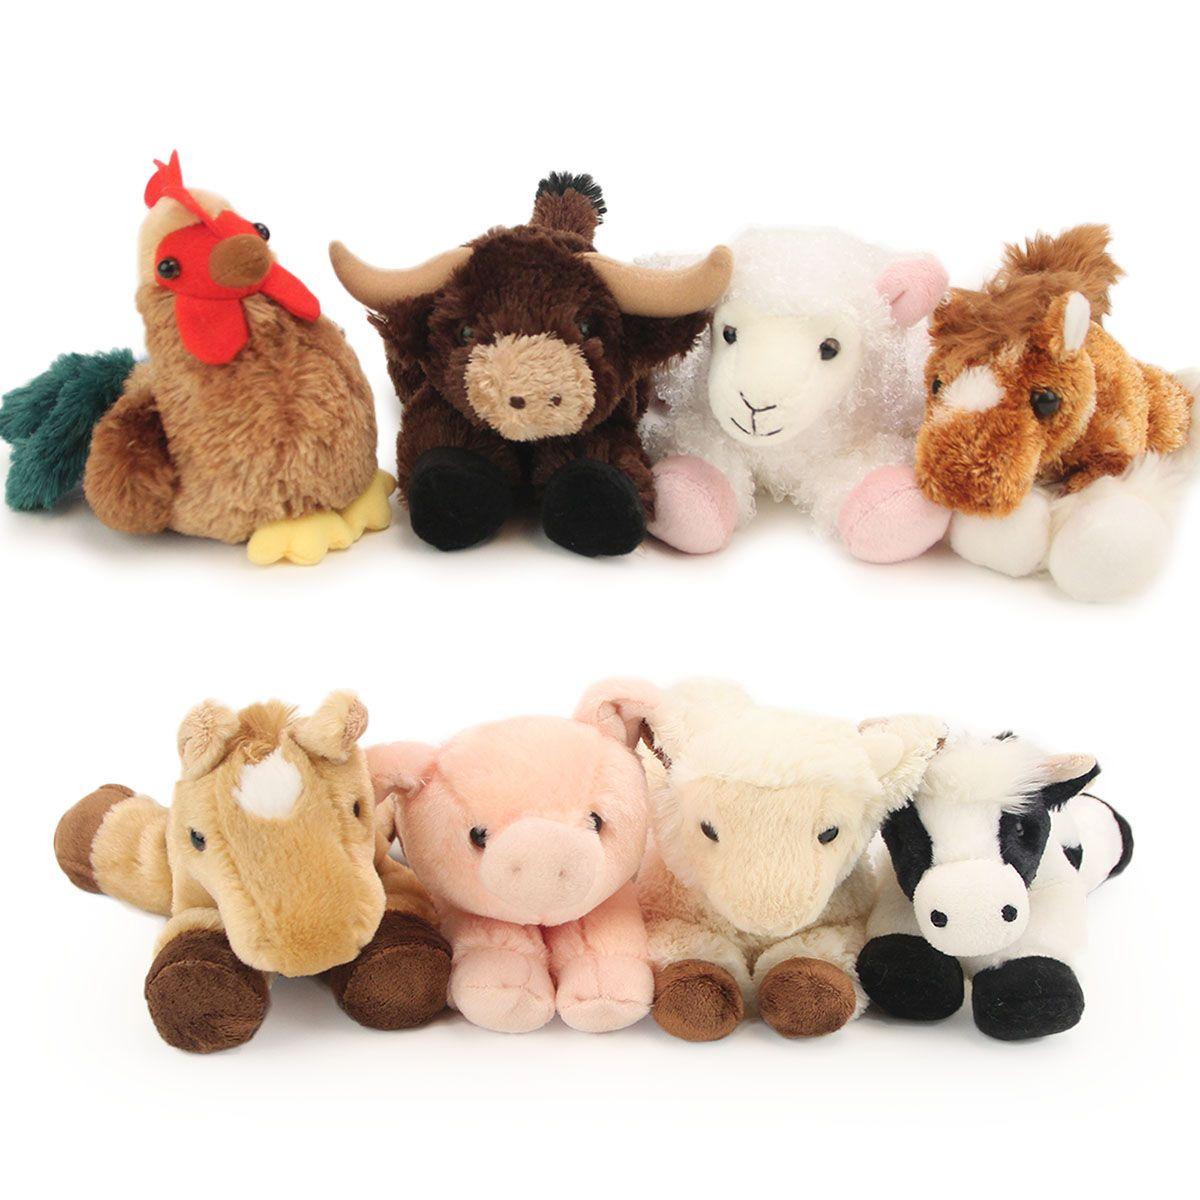 Stuffed Farm Animals Farm Animals Baby Farm Animals Animal Babies Toys